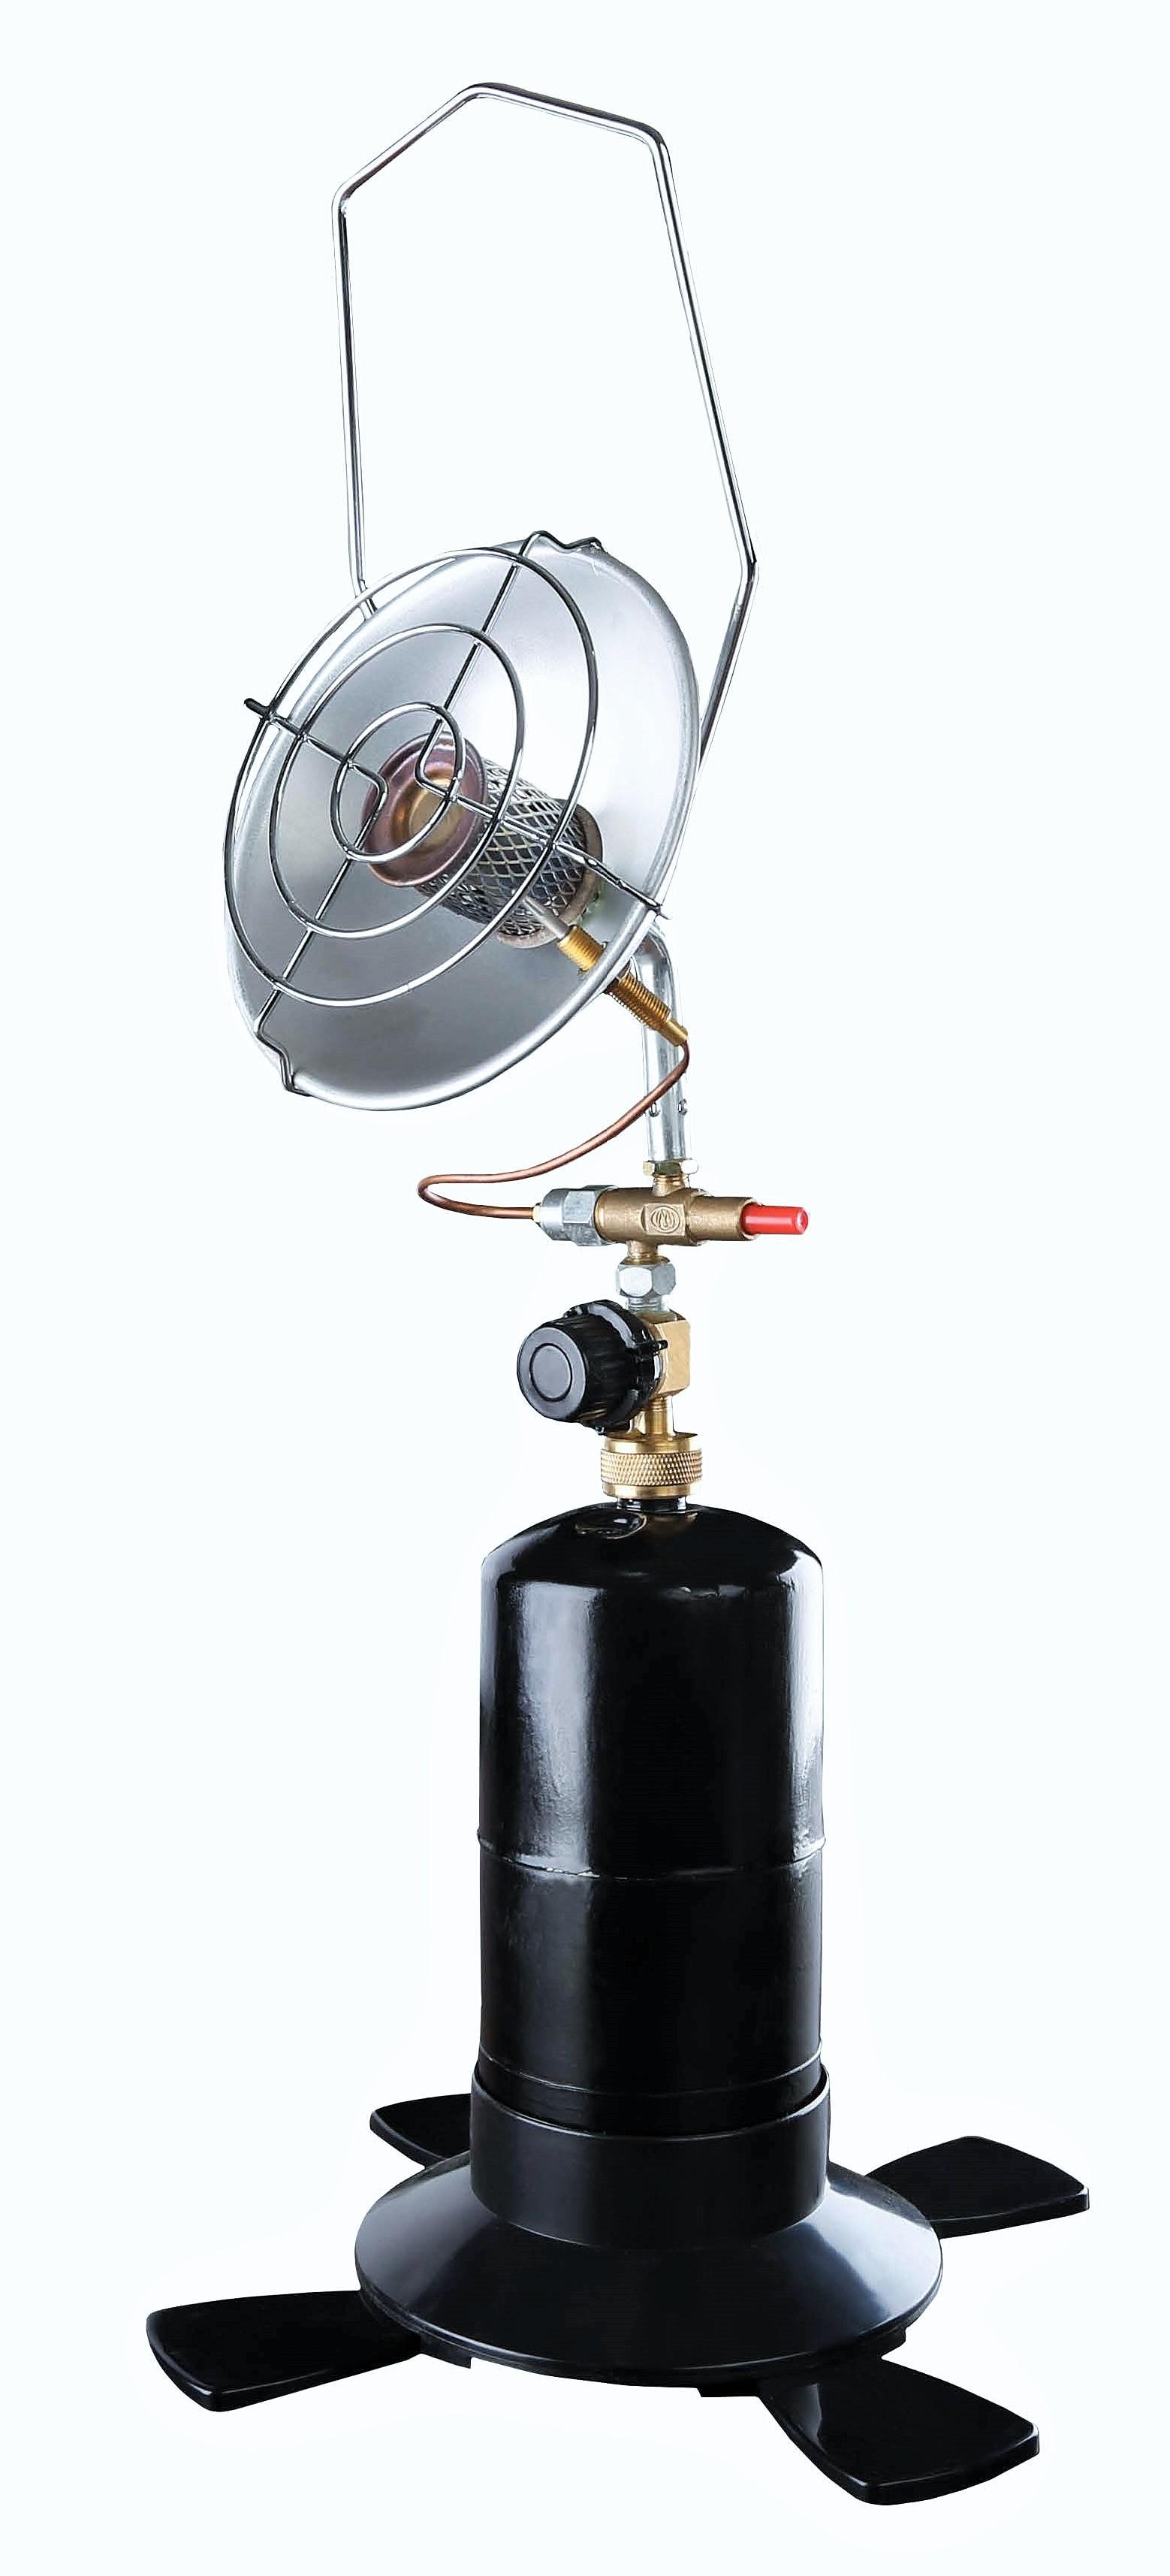 Single Burner 1lb Propane Tank Heater Shop Heaters